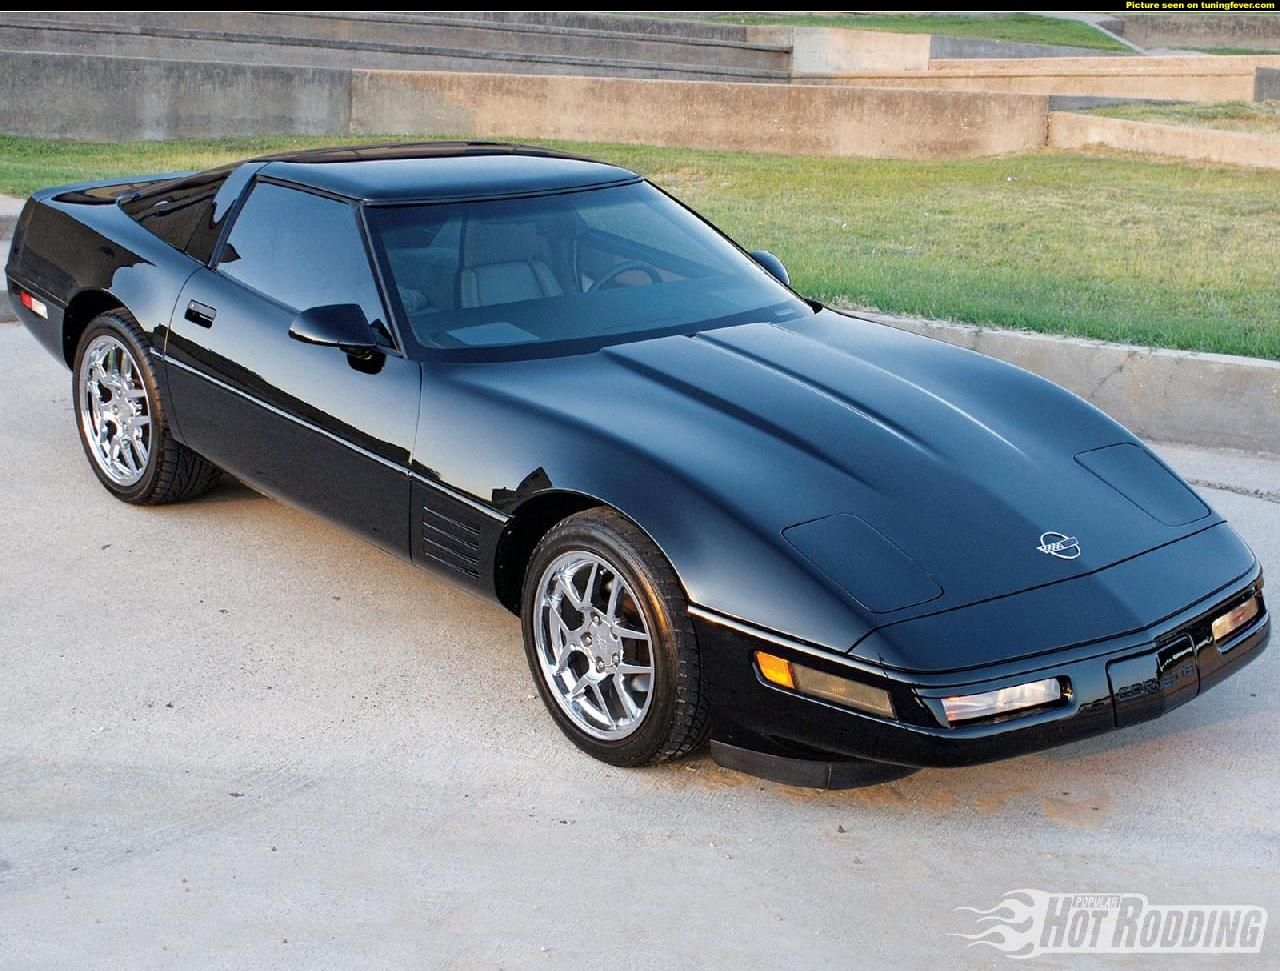 1985 Chevrolet Corvette C4 My Husband S Present Toy In The Garage Chevrolet Corvette C4 Corvette Corvette C4